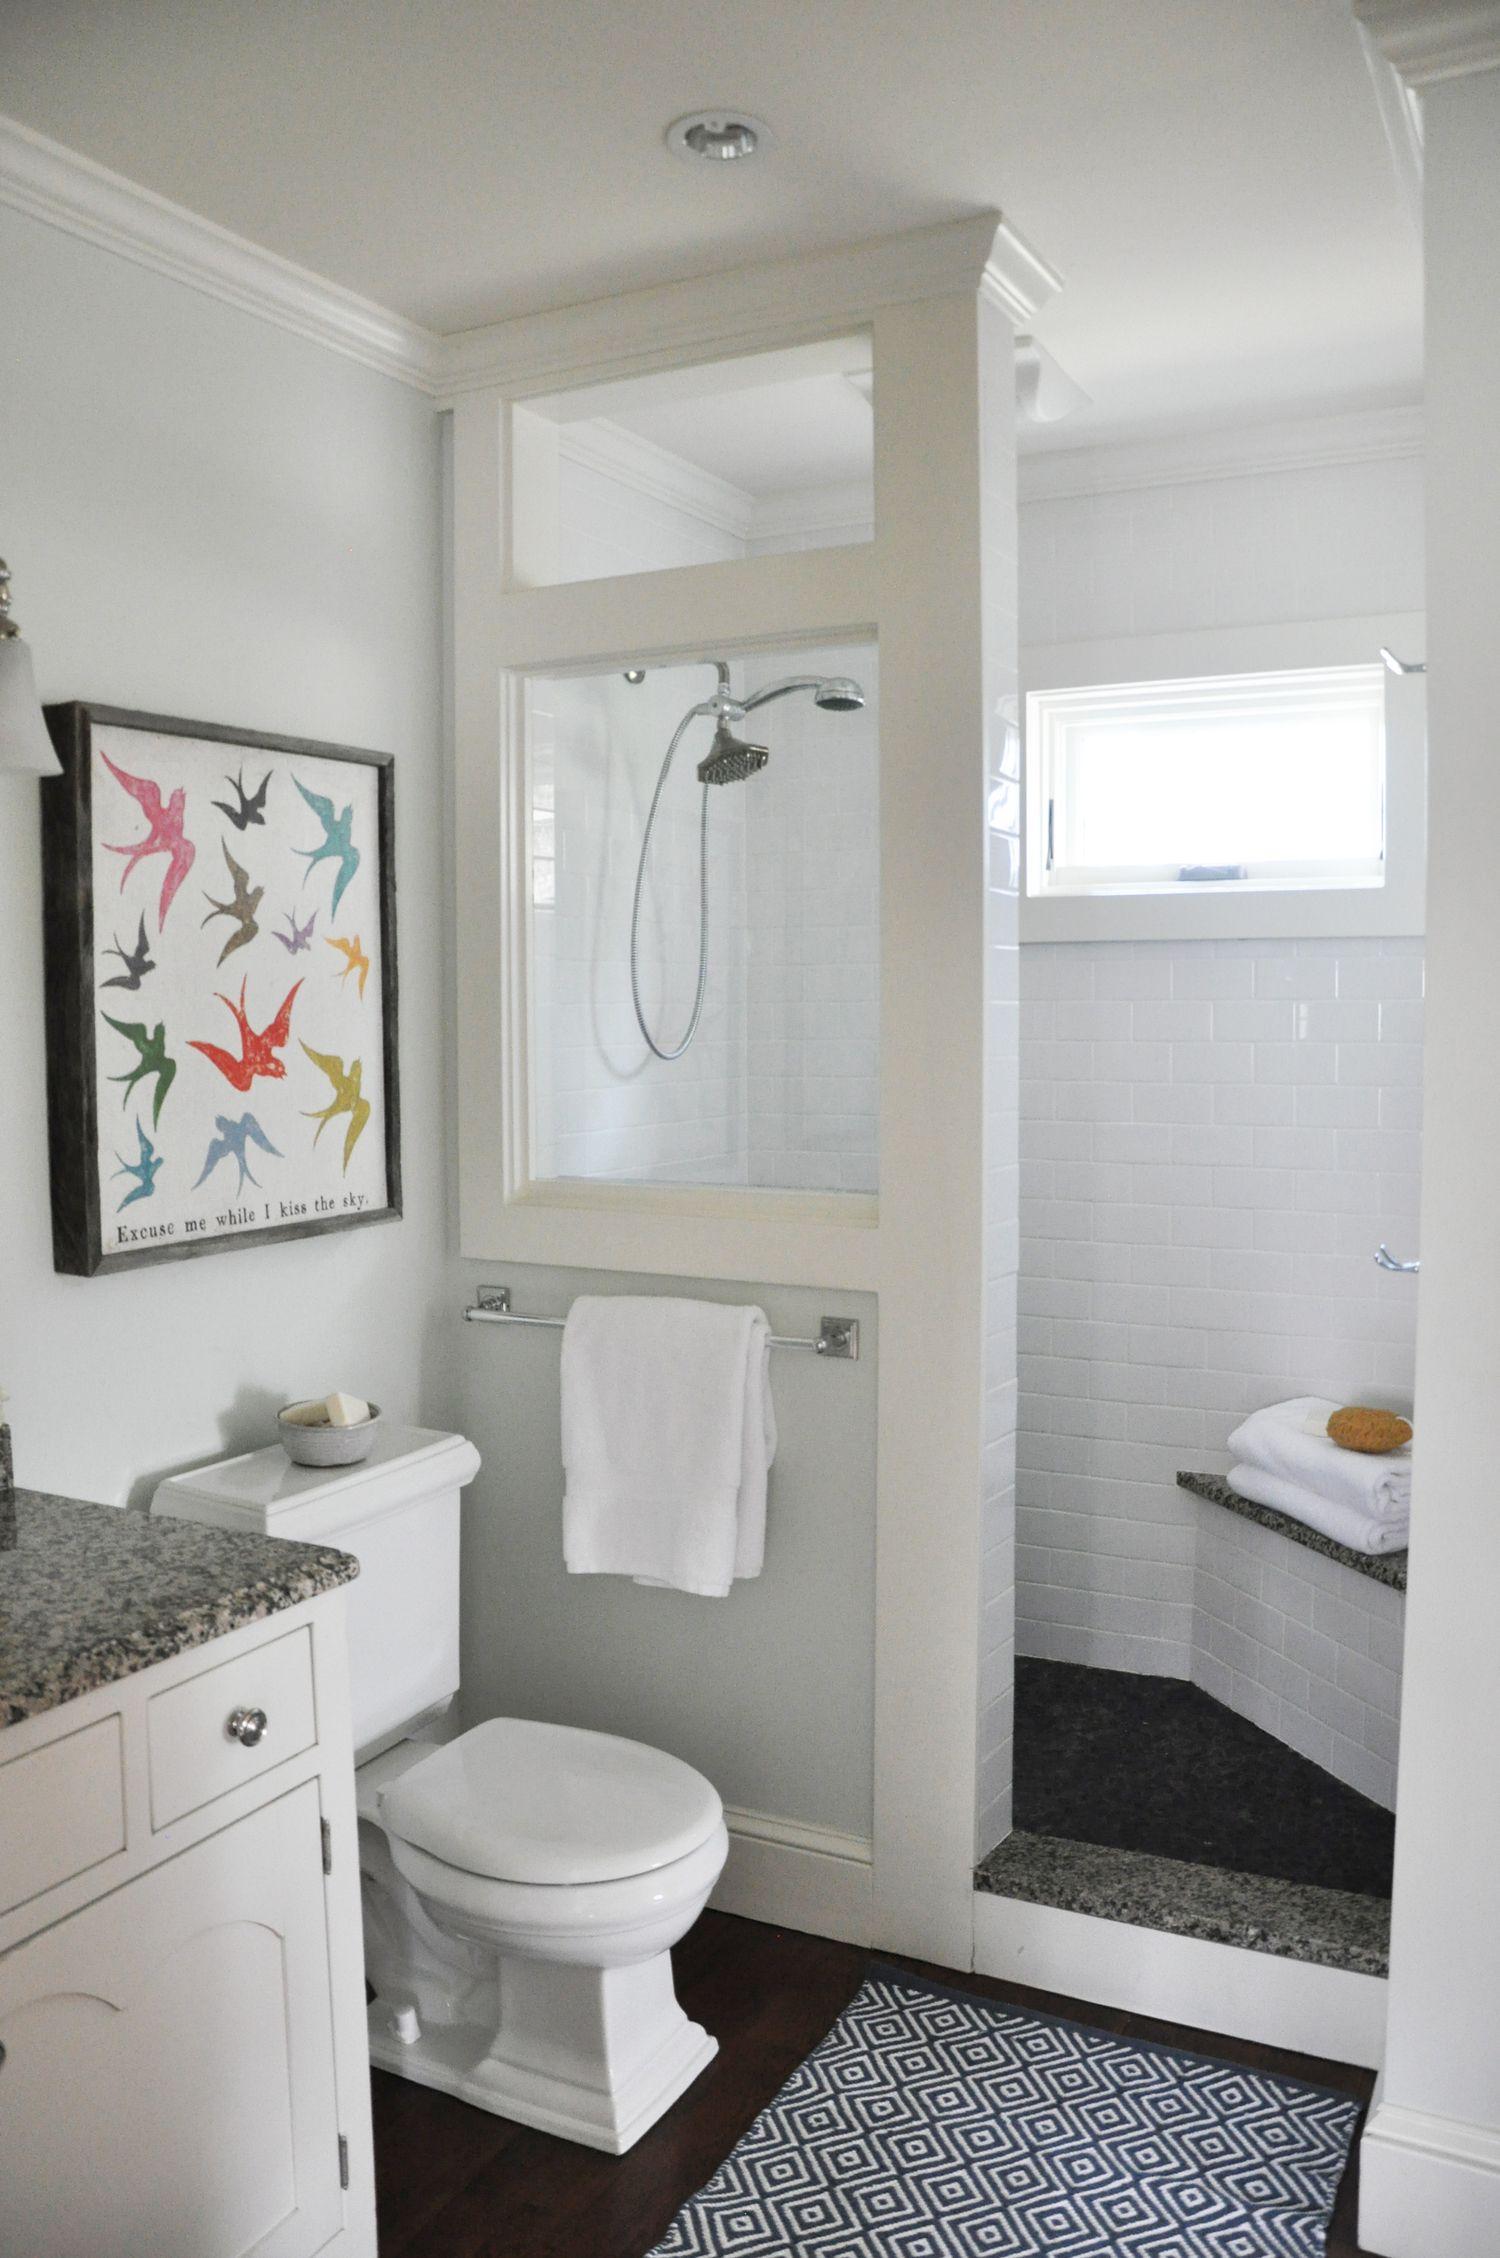 DIY Farmhouse Bathroom Remodel Plans for Sale! — Teaselwood Design